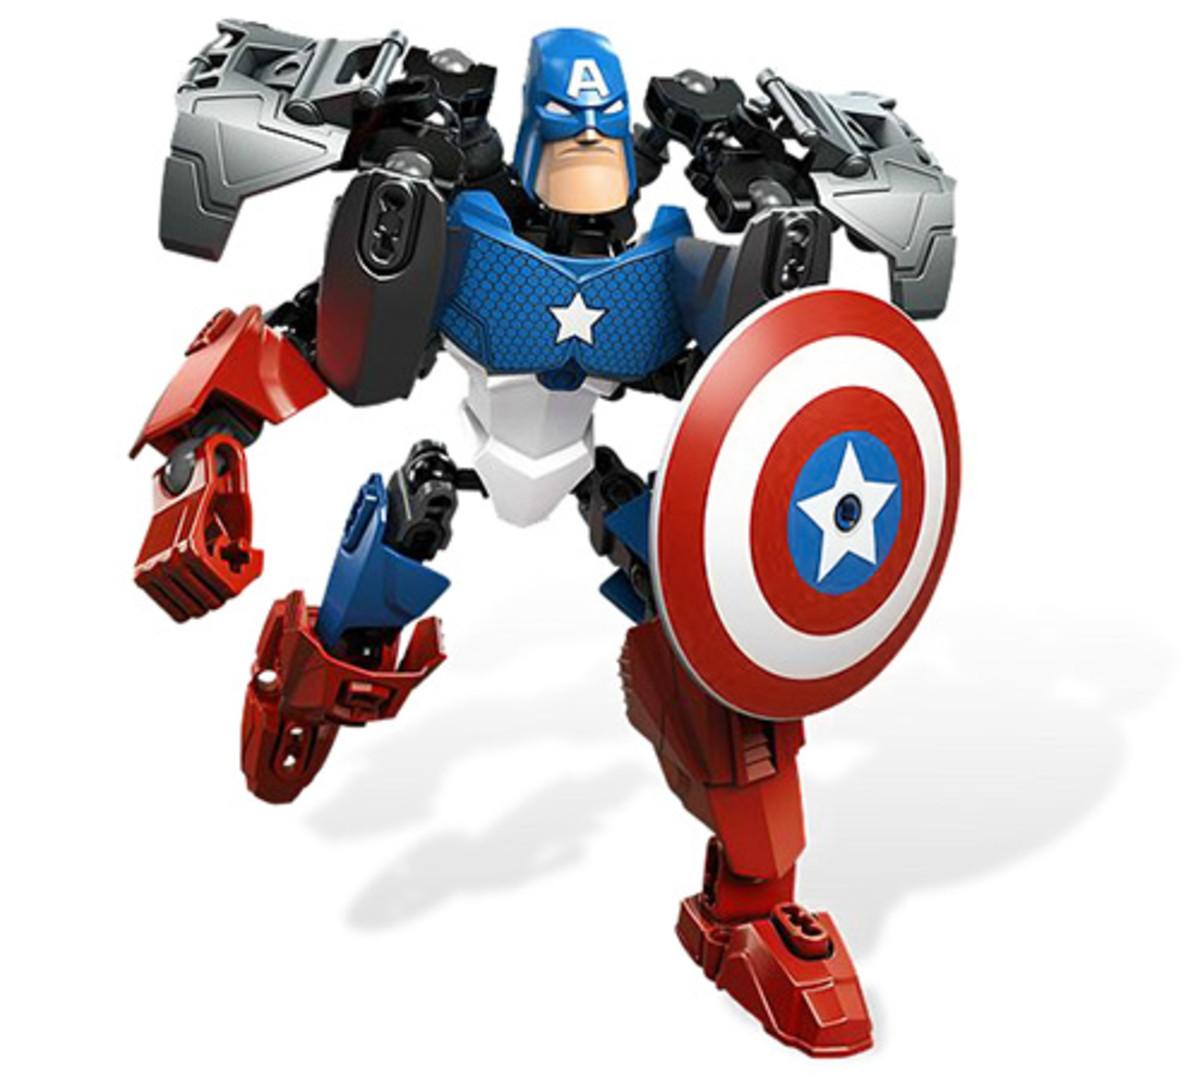 LEGO Ultrabuild Captain America 4597 Assembled